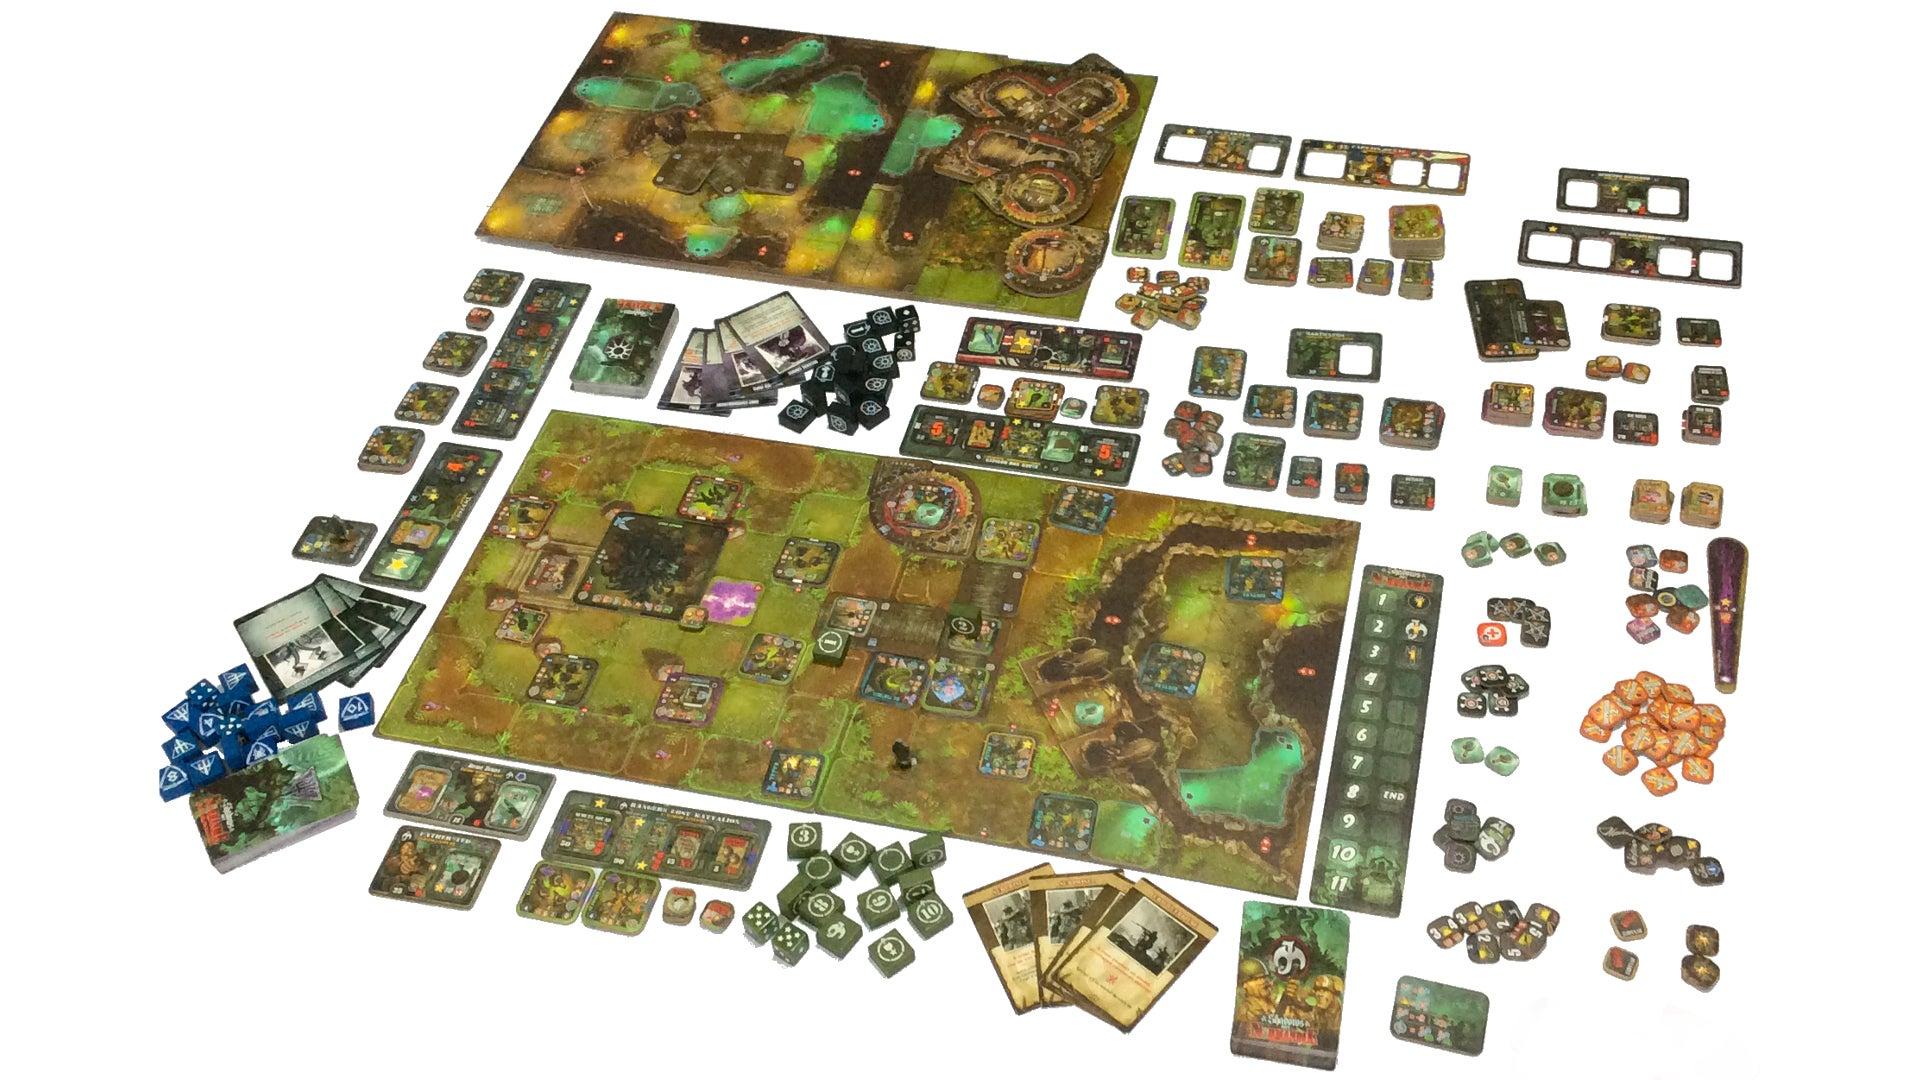 shadows-over-normandie-board-game-gameplay-layout.jpg